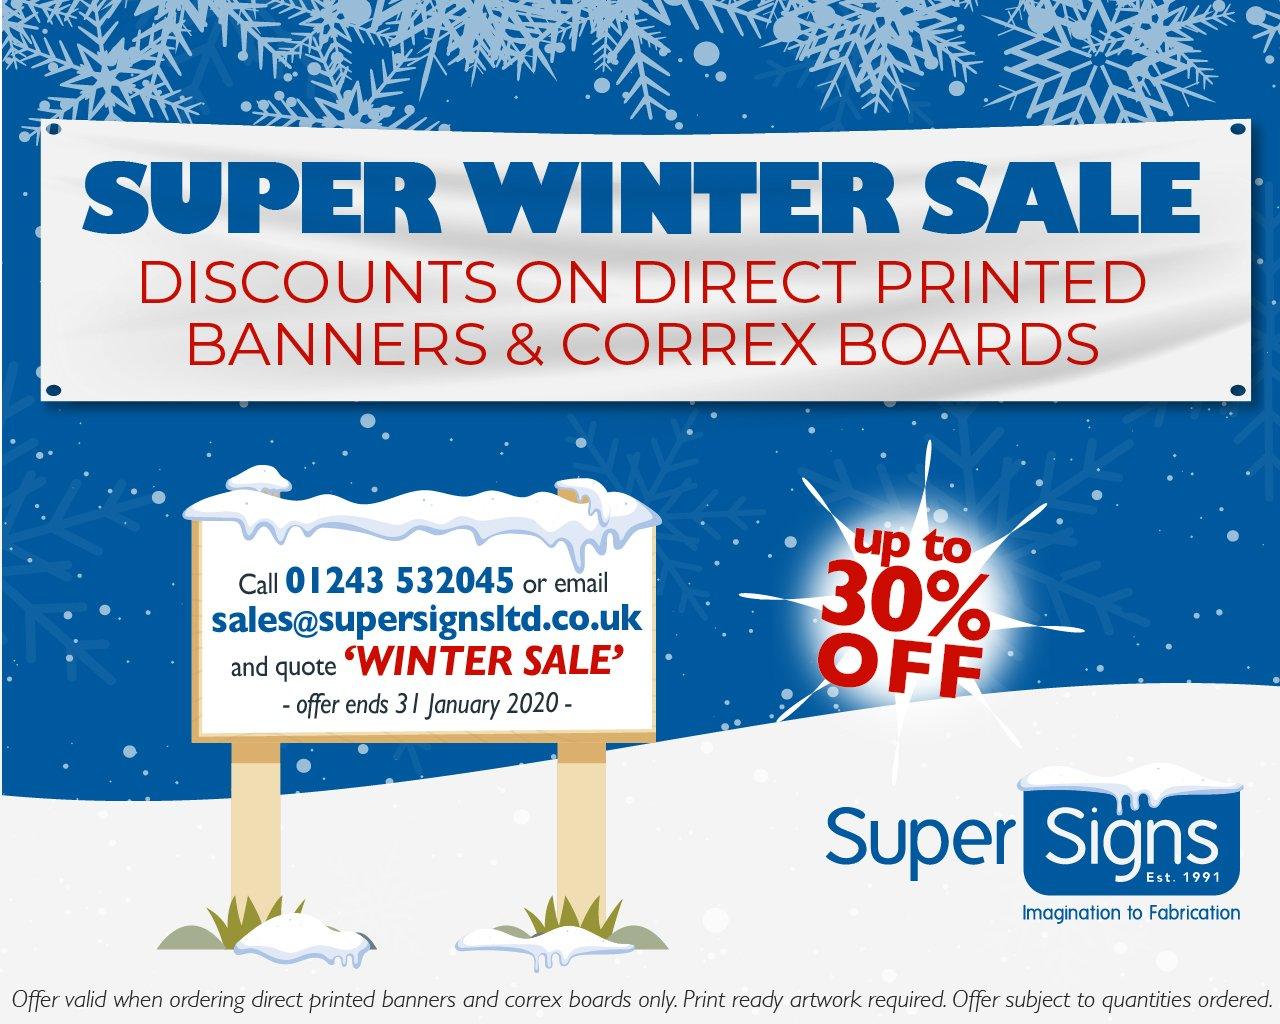 supersigns super winter sale